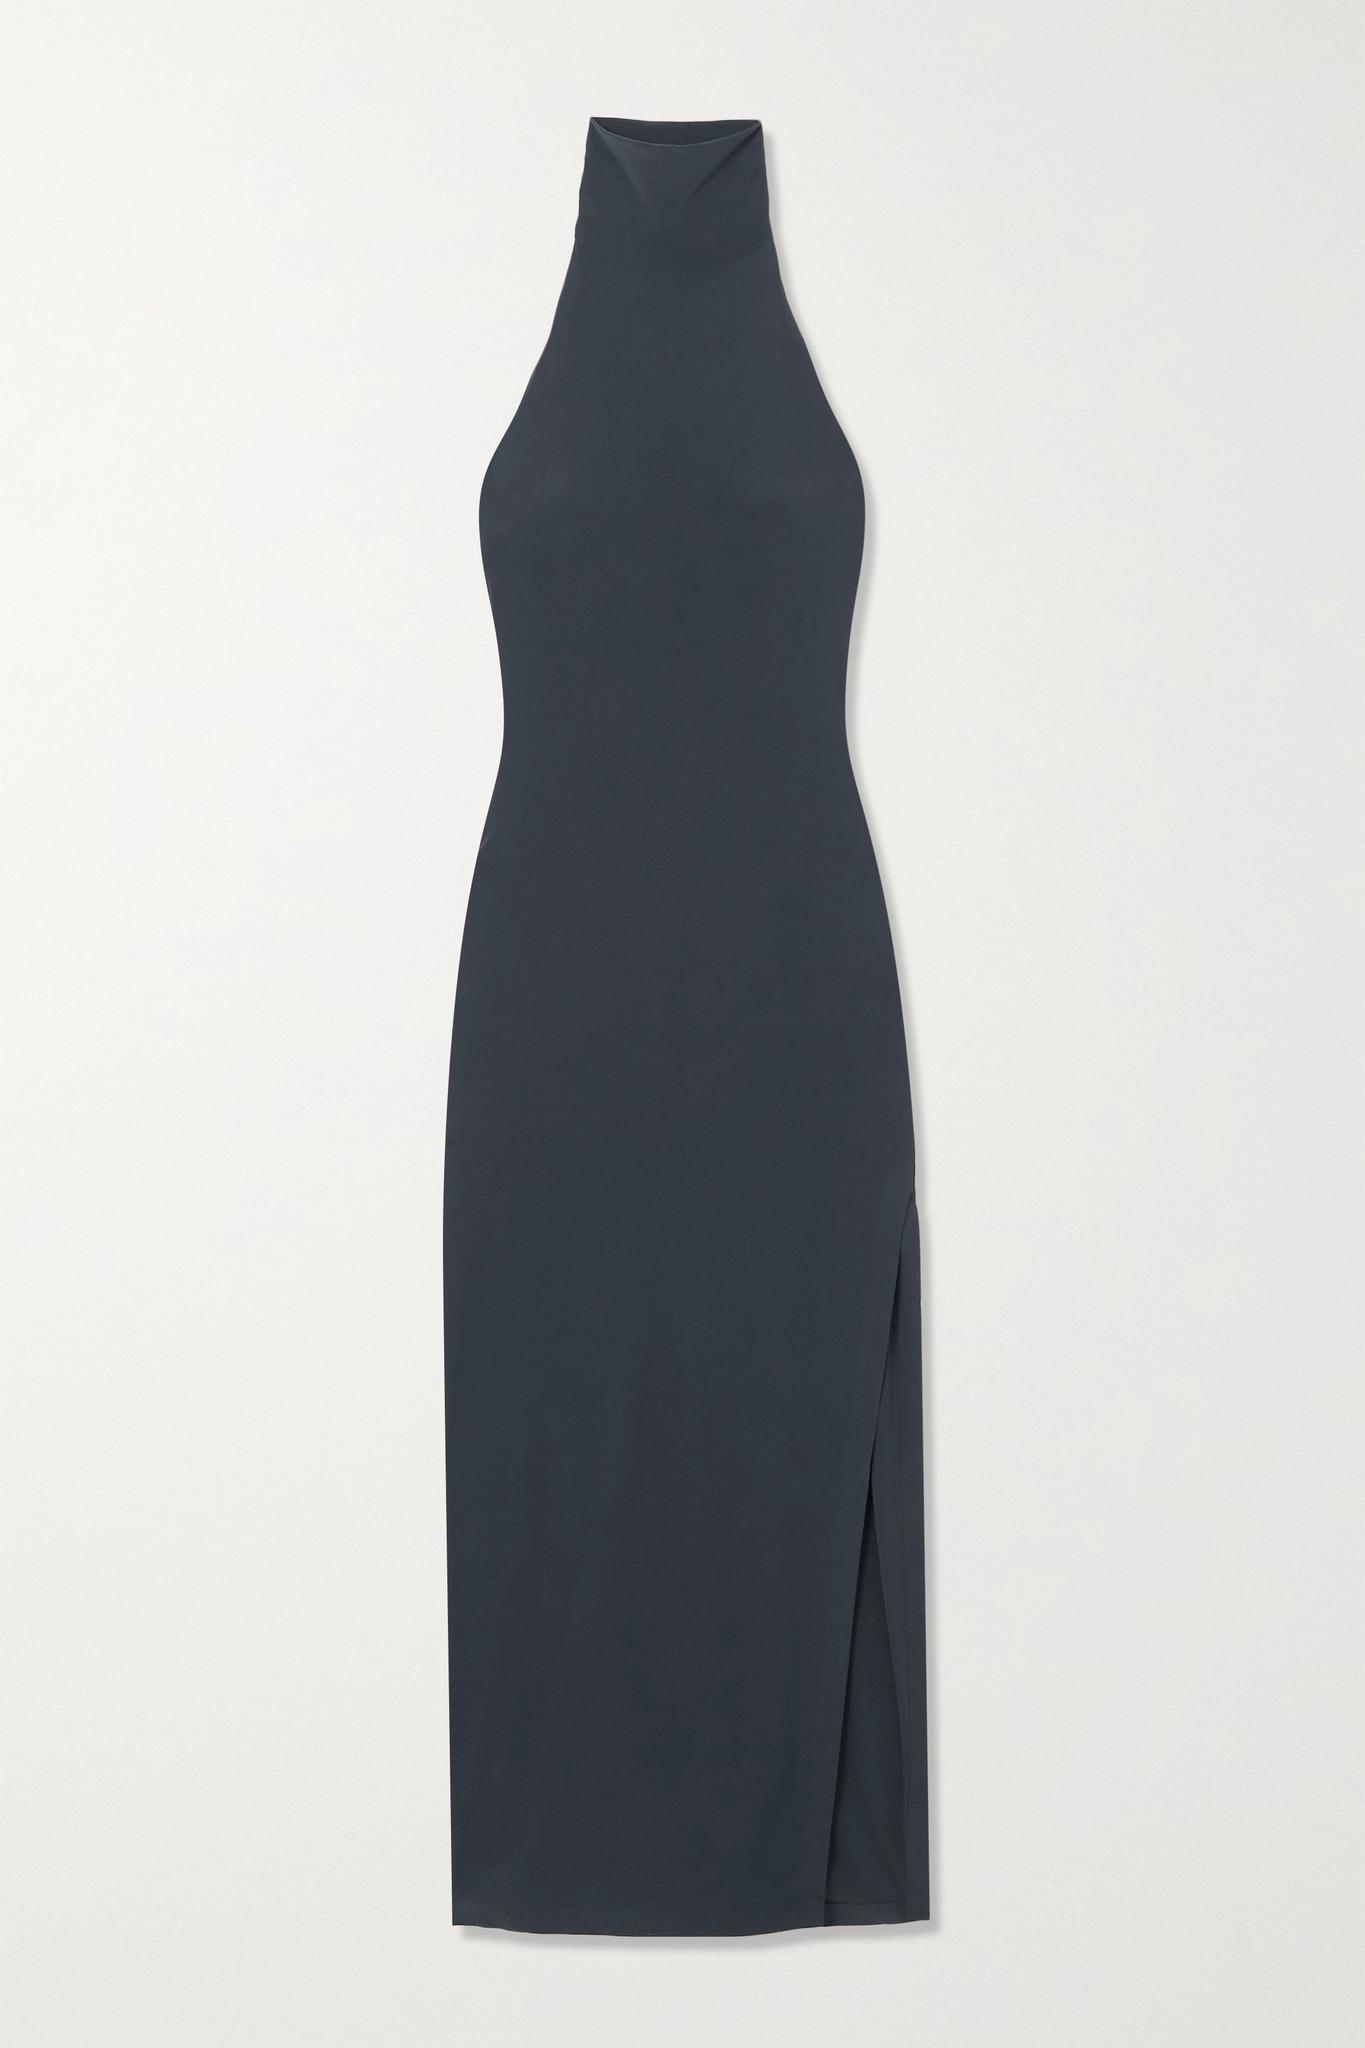 NORMA KAMALI - 弹力针织挂脖超长连衣裙 - 蓝色 - medium